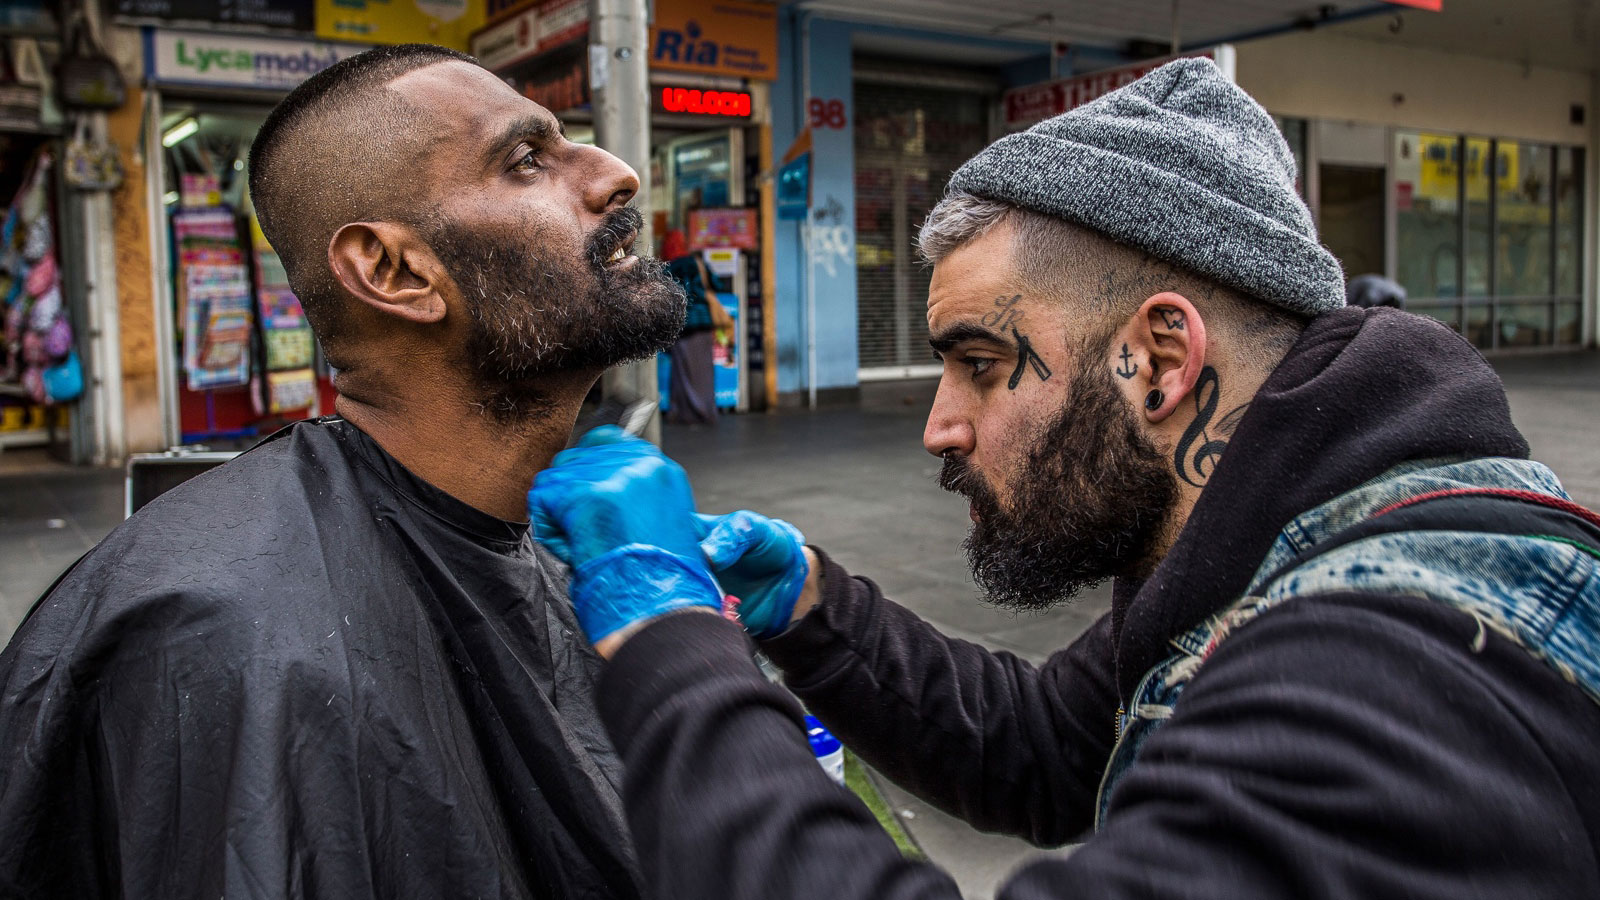 streets-barber-1.jpg